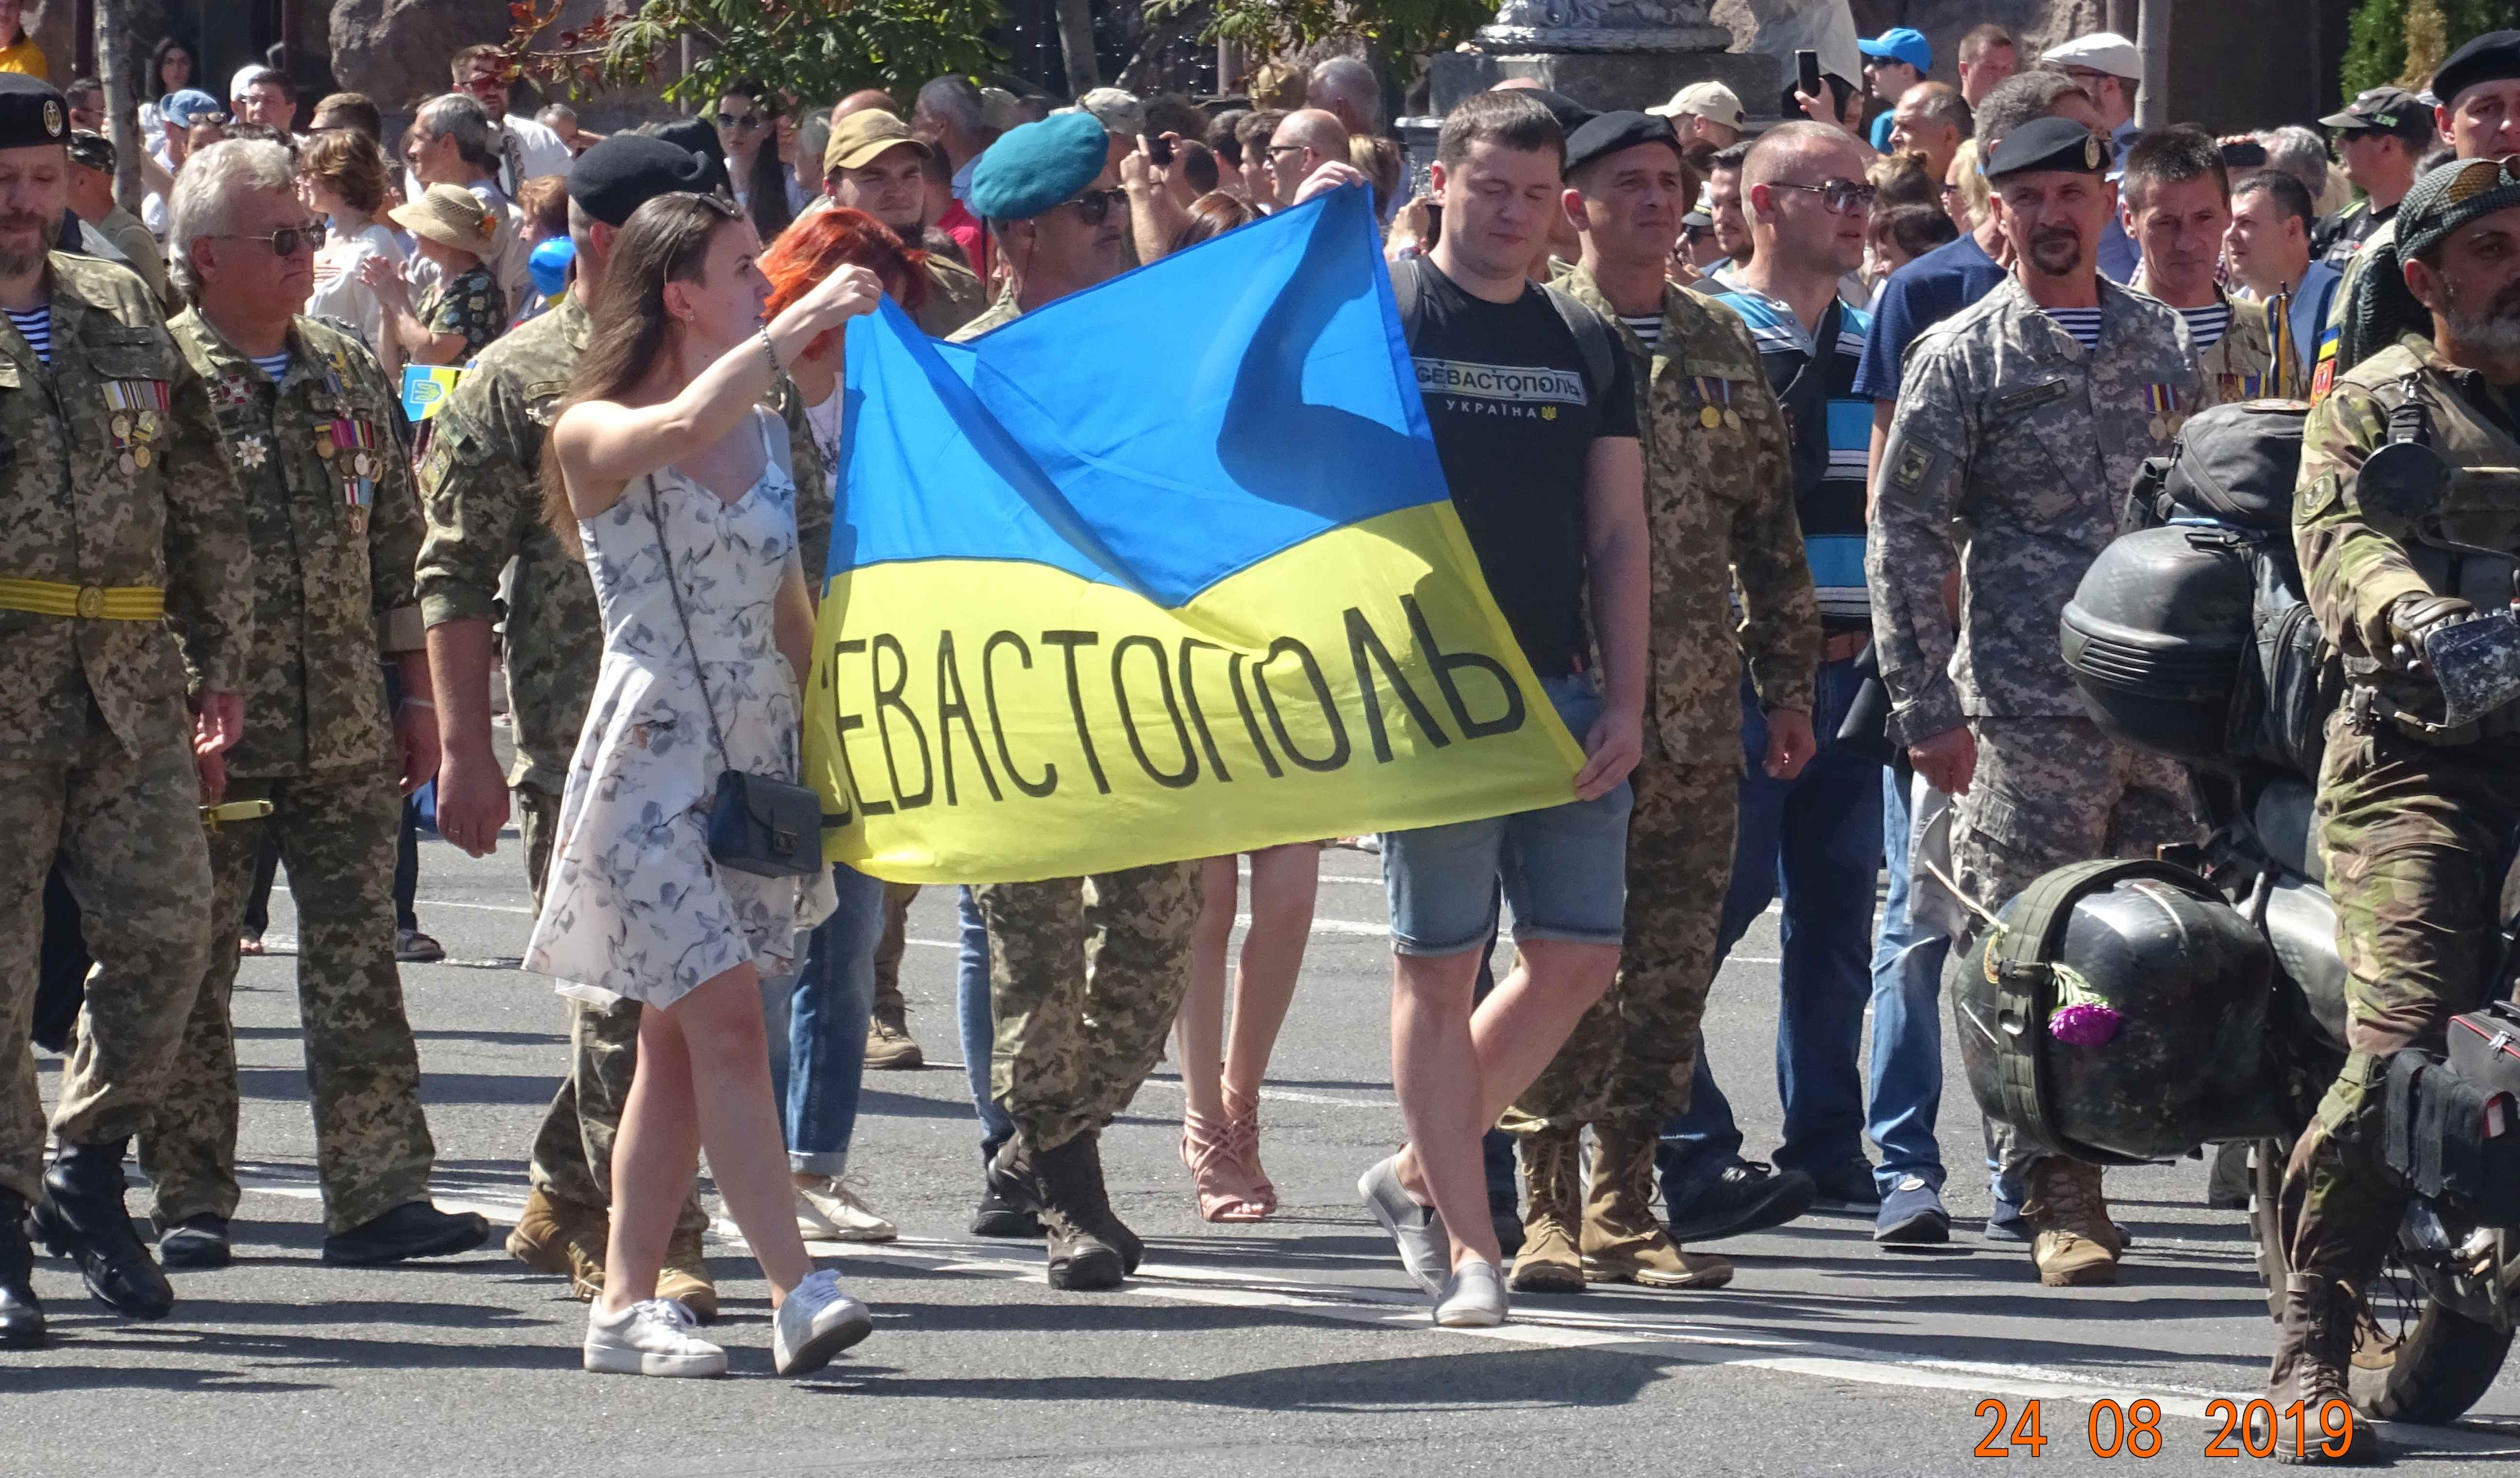 Defenders-of-Ukraine-Parad-24.Aug.19 - DSC06244.jpg